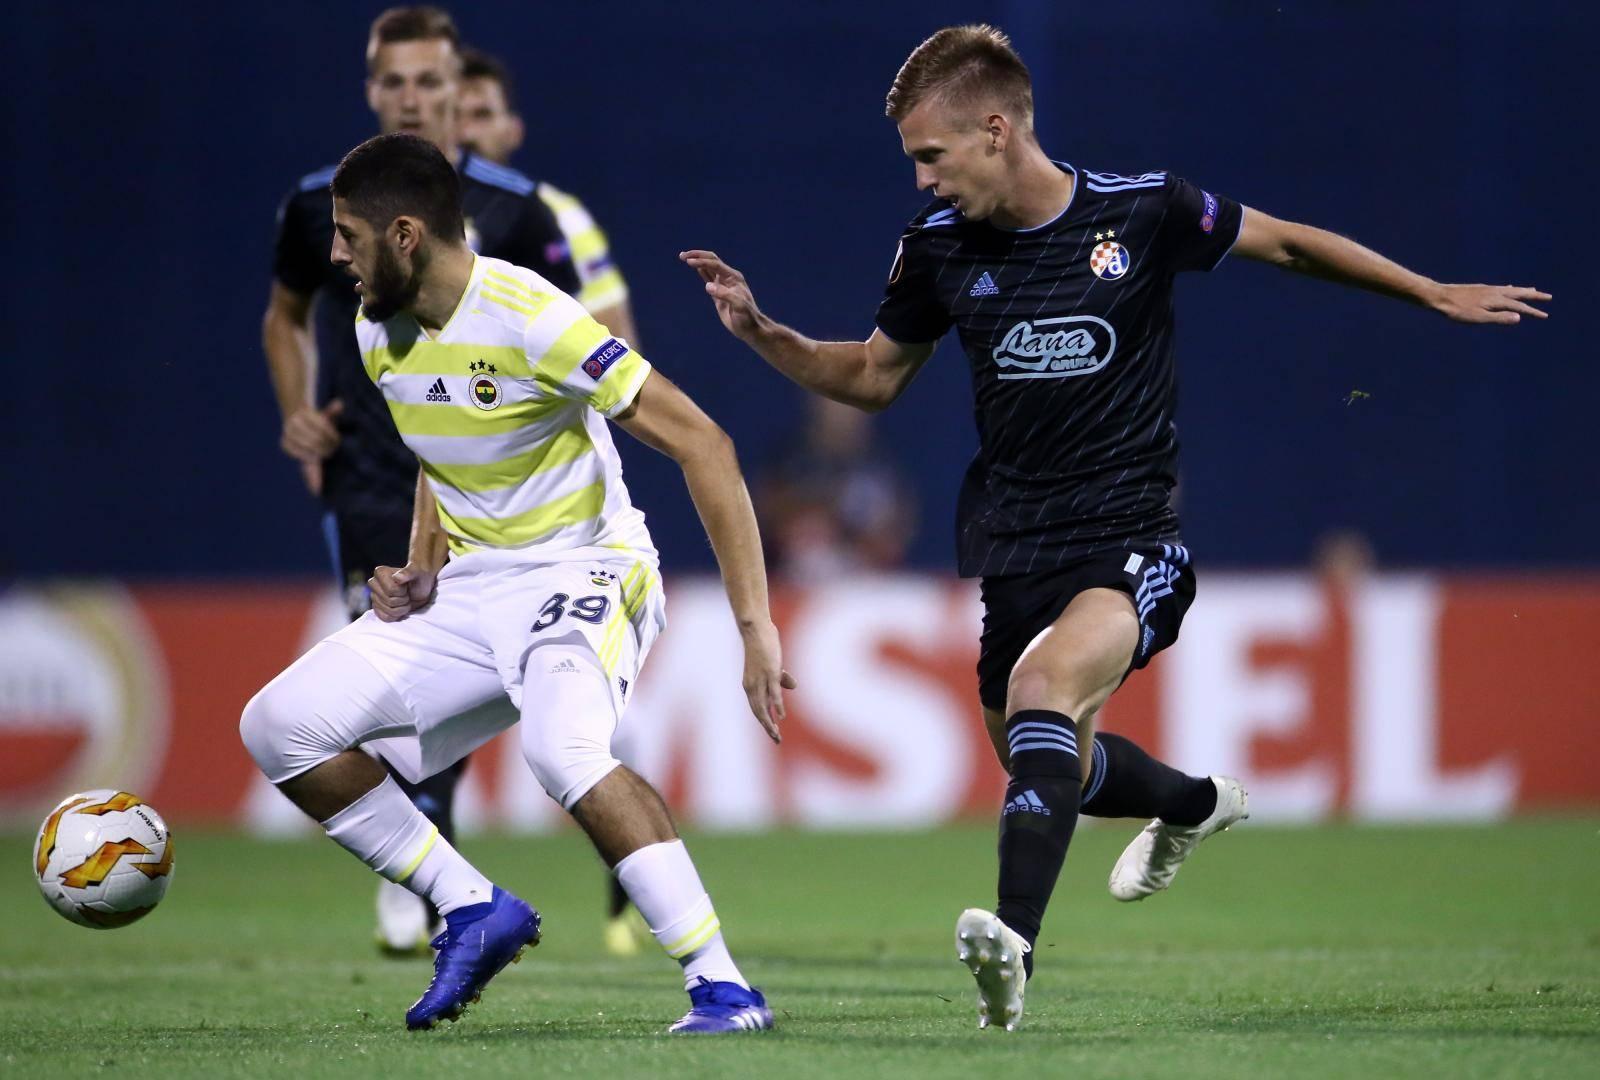 Zagreb: Dinamo i Fenerbahce u utrci za pobjedu u 1. kolu Europske lige